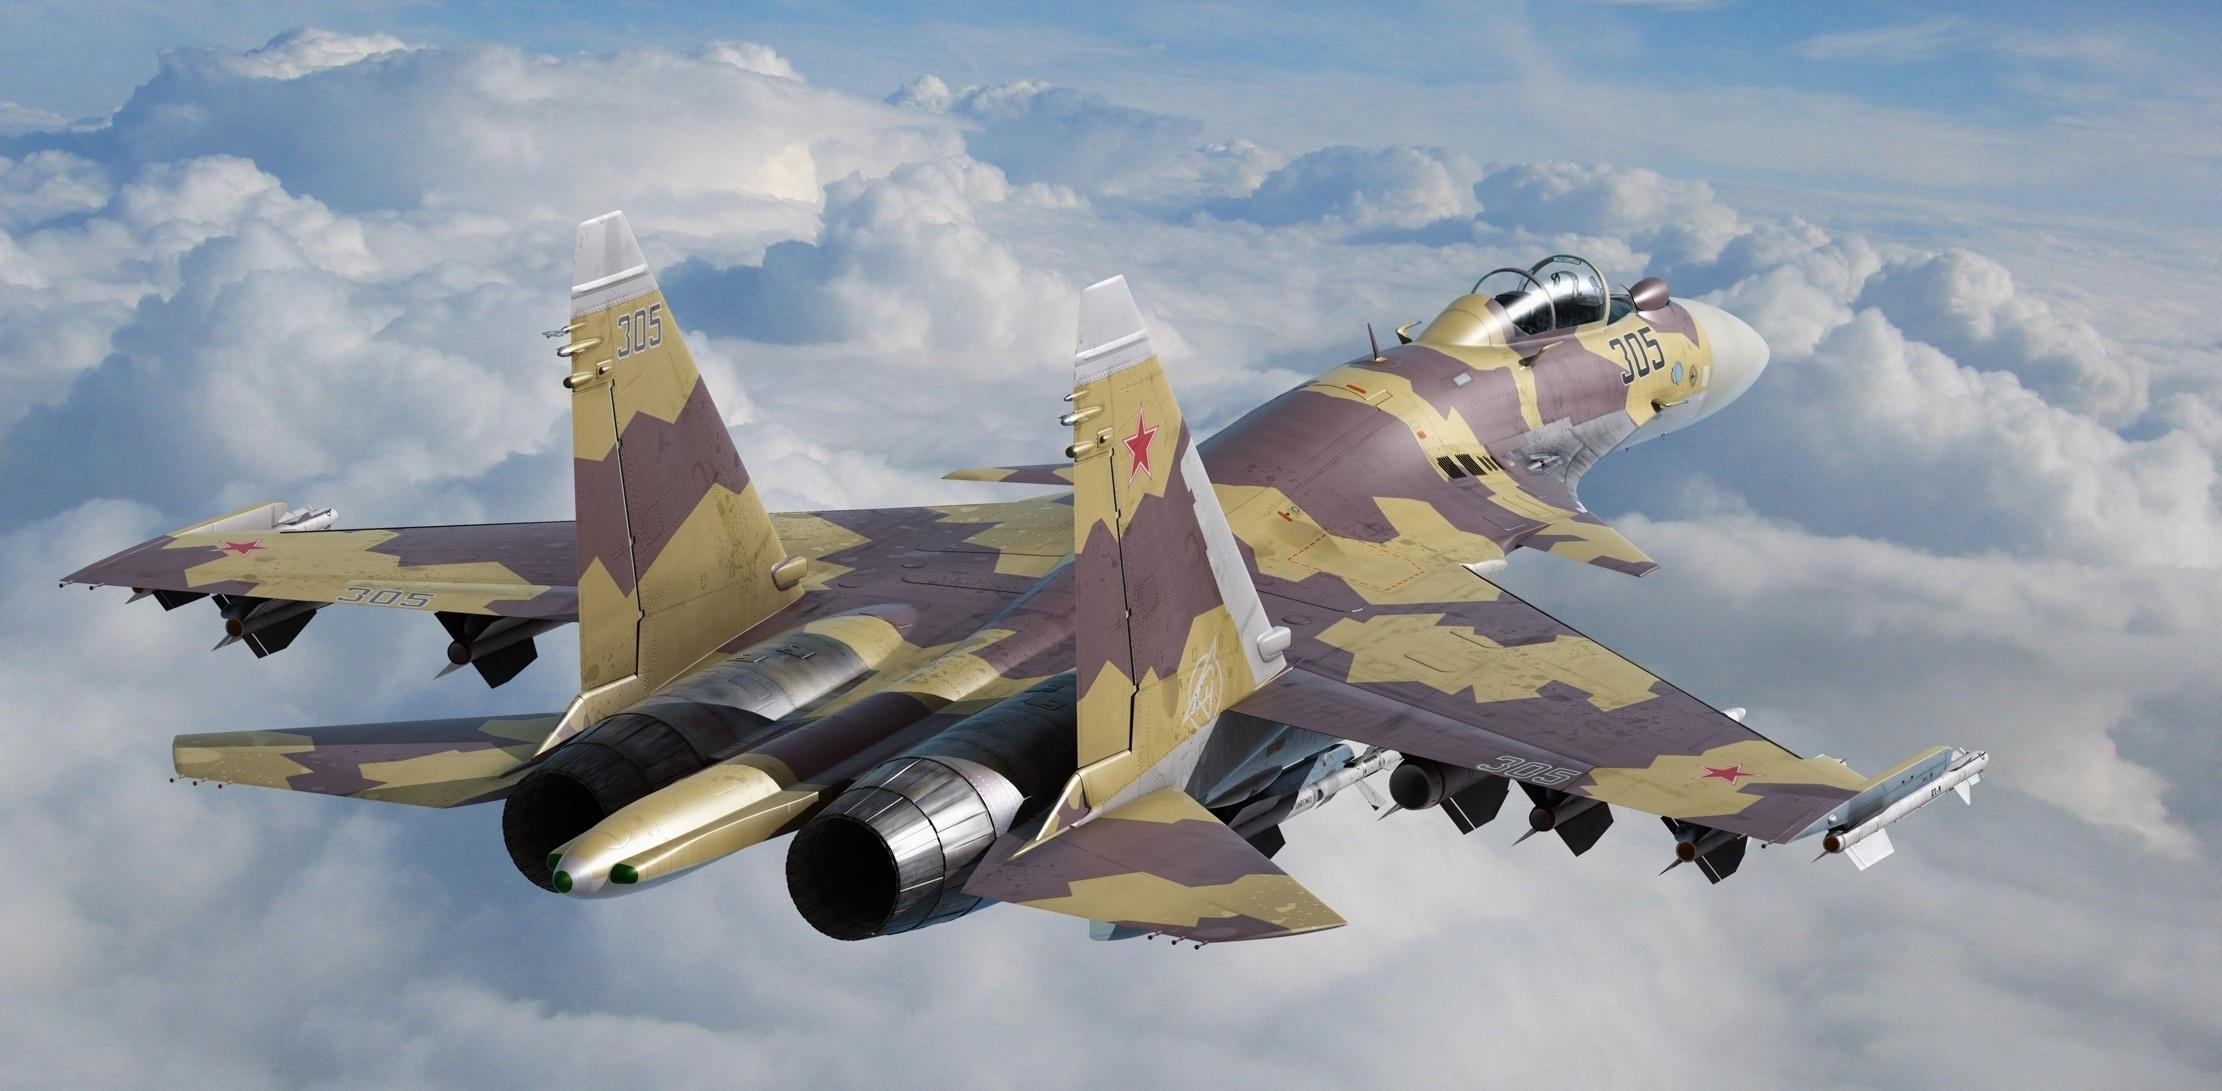 military picture sukhoi su - photo #15